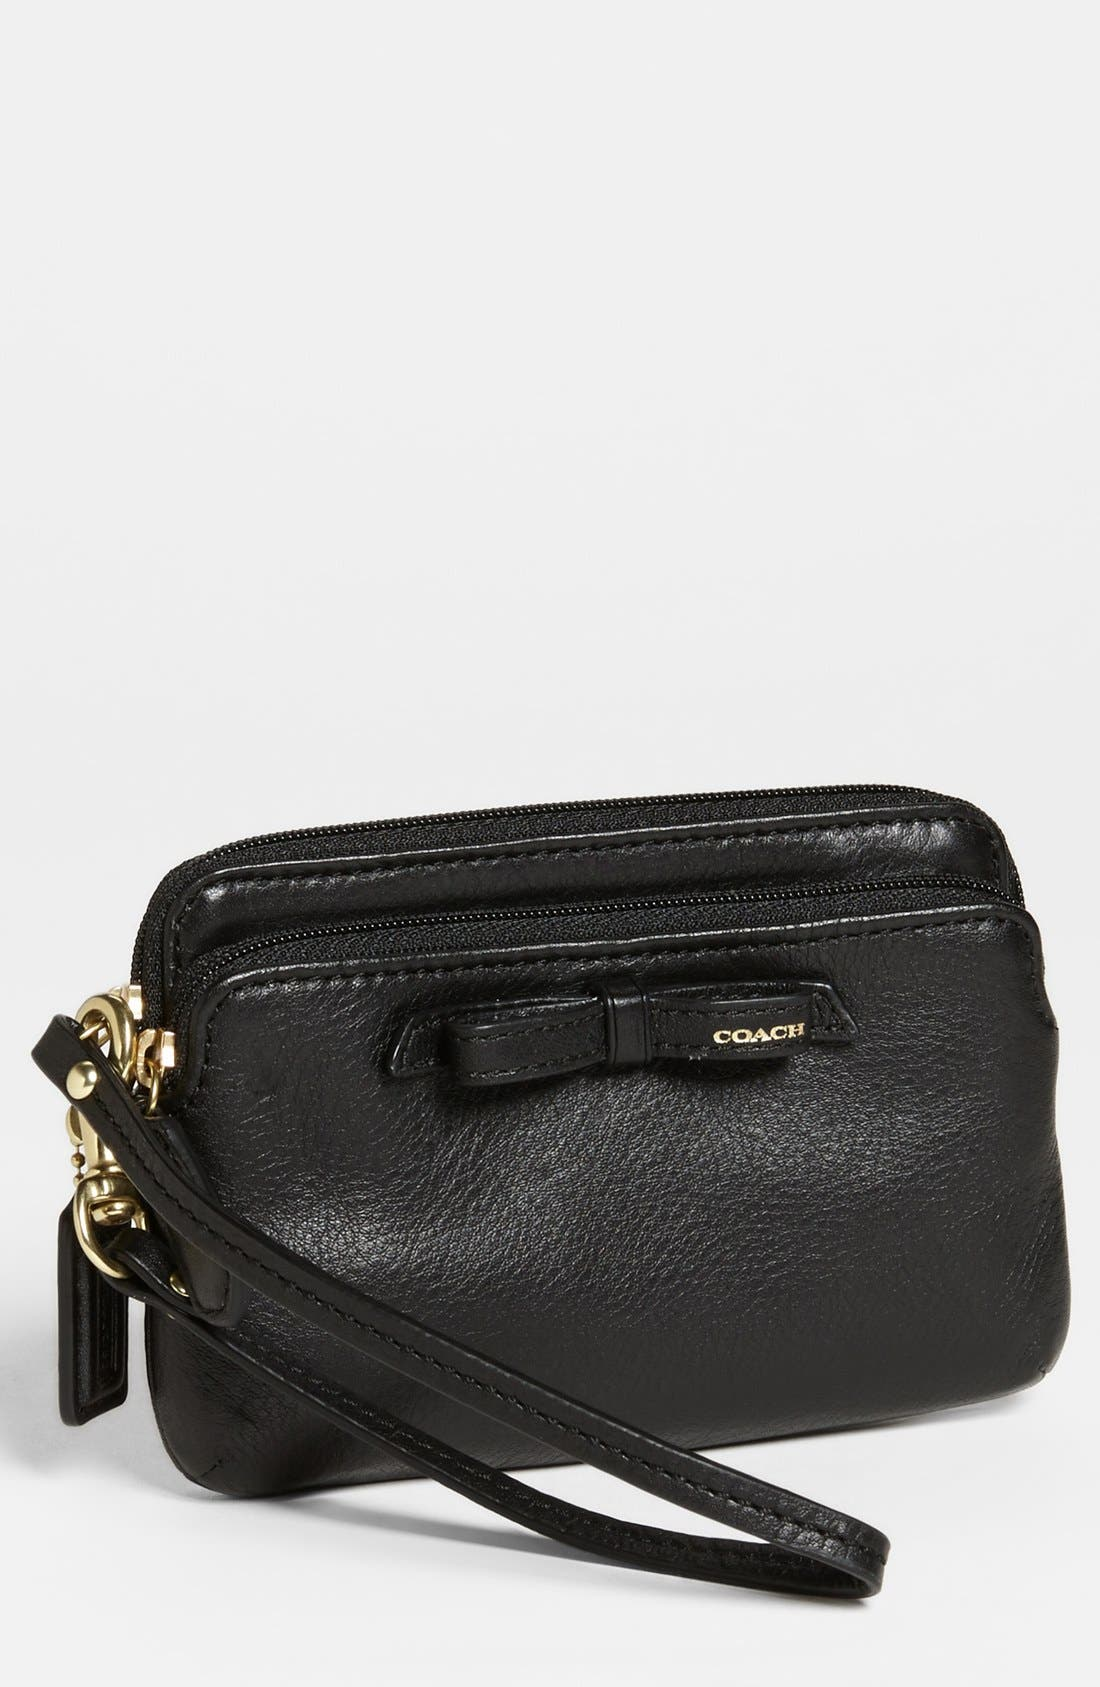 Alternate Image 1 Selected - COACH 'Poppy' Leather Wristlet